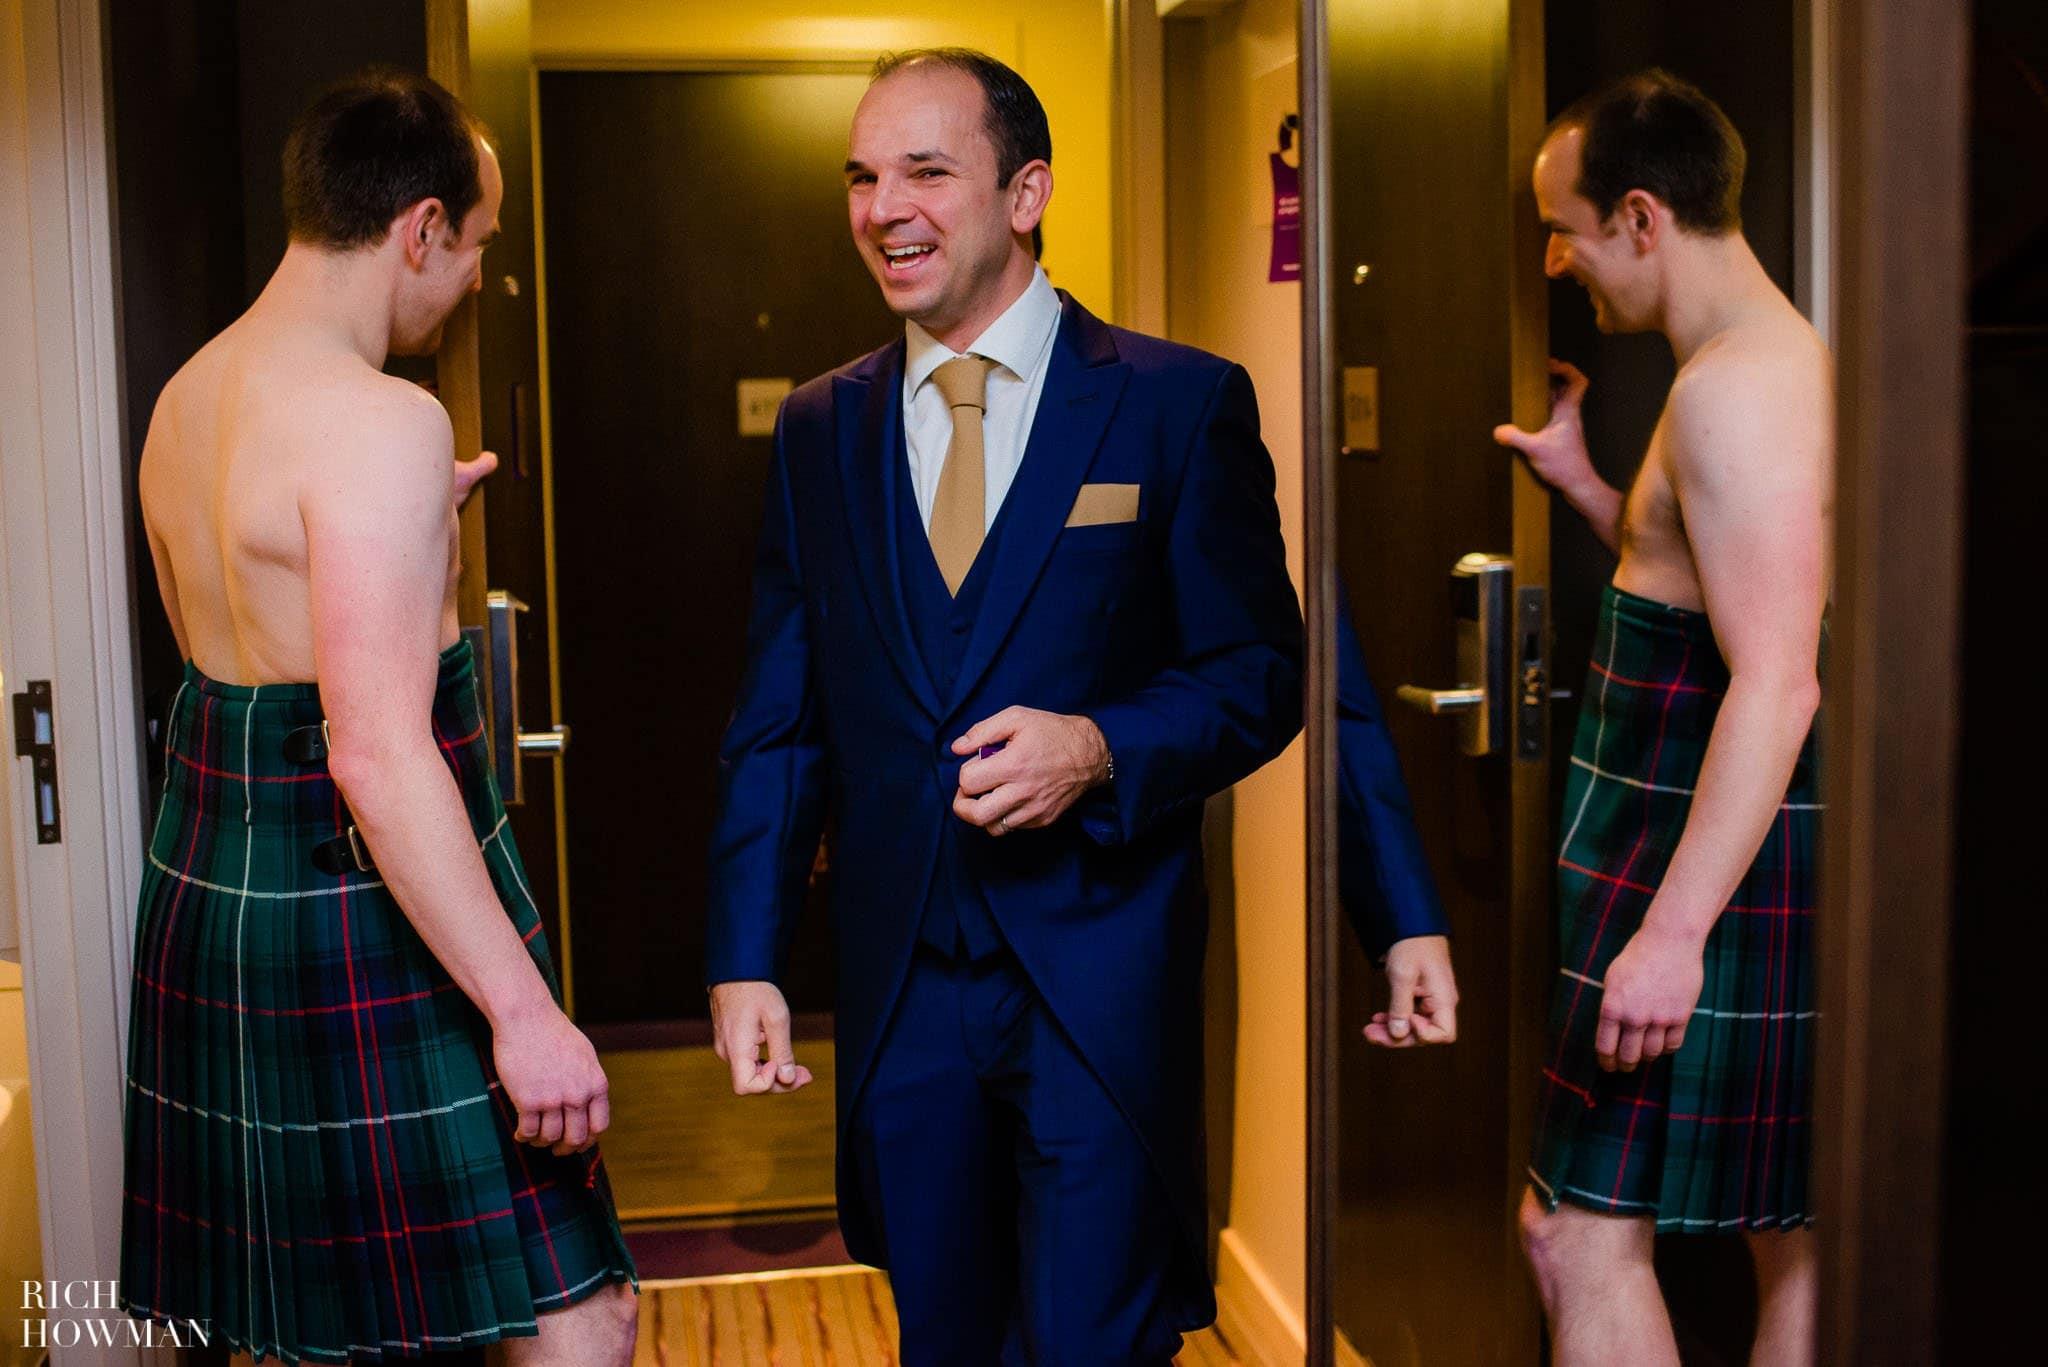 Lillibrooke Manor Photographers - Christmas Wedding 11